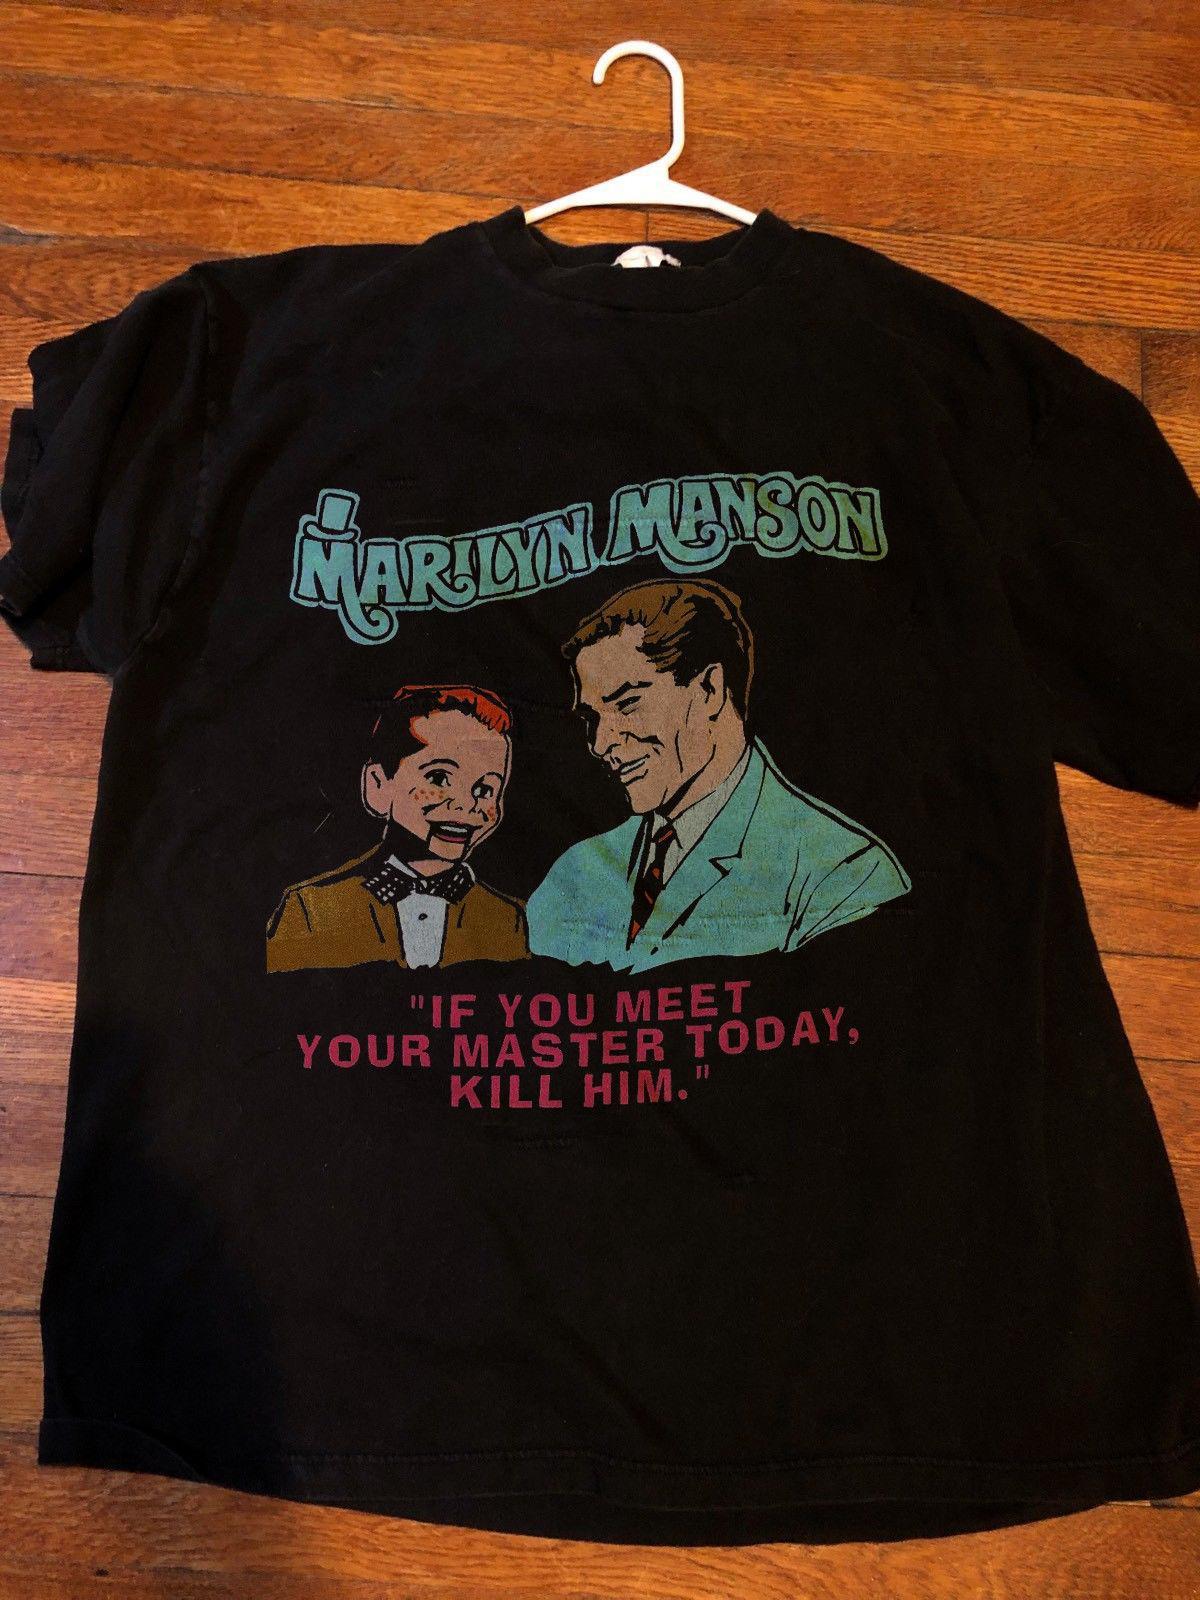 c97fb9f53ace Marilyn Manson Vintage 1995 Shirt Meet Your Master Reprint 2018 New Men Tee  2018 Fashion T Shirts Summer Short Sleeves Sports T Shirts Men T Shirts  From ...